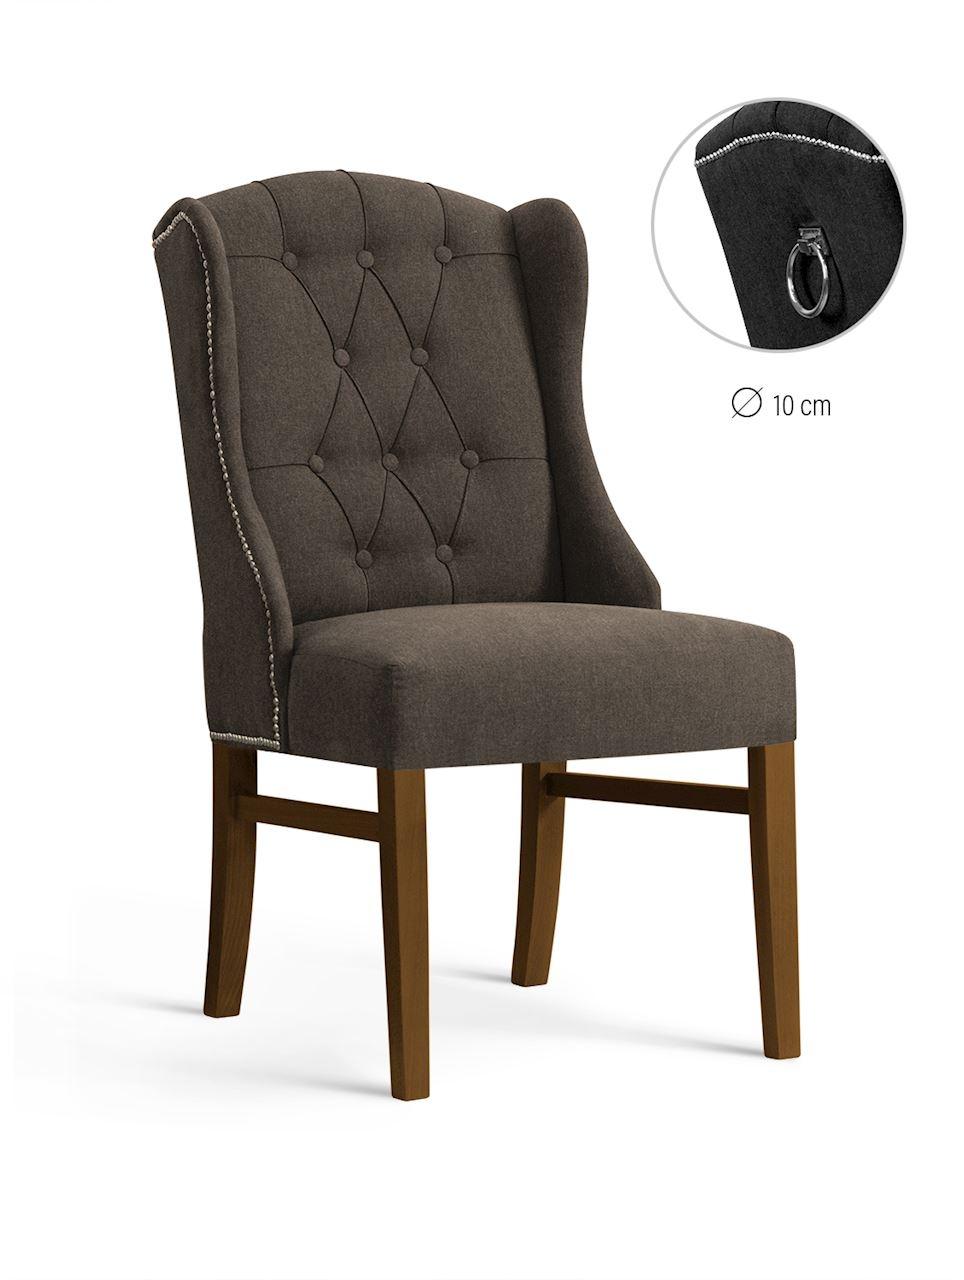 Scaun tapitat cu stofa, cu picioare din lemn Royal Brown / Walnut, l55xA74xH105 cm